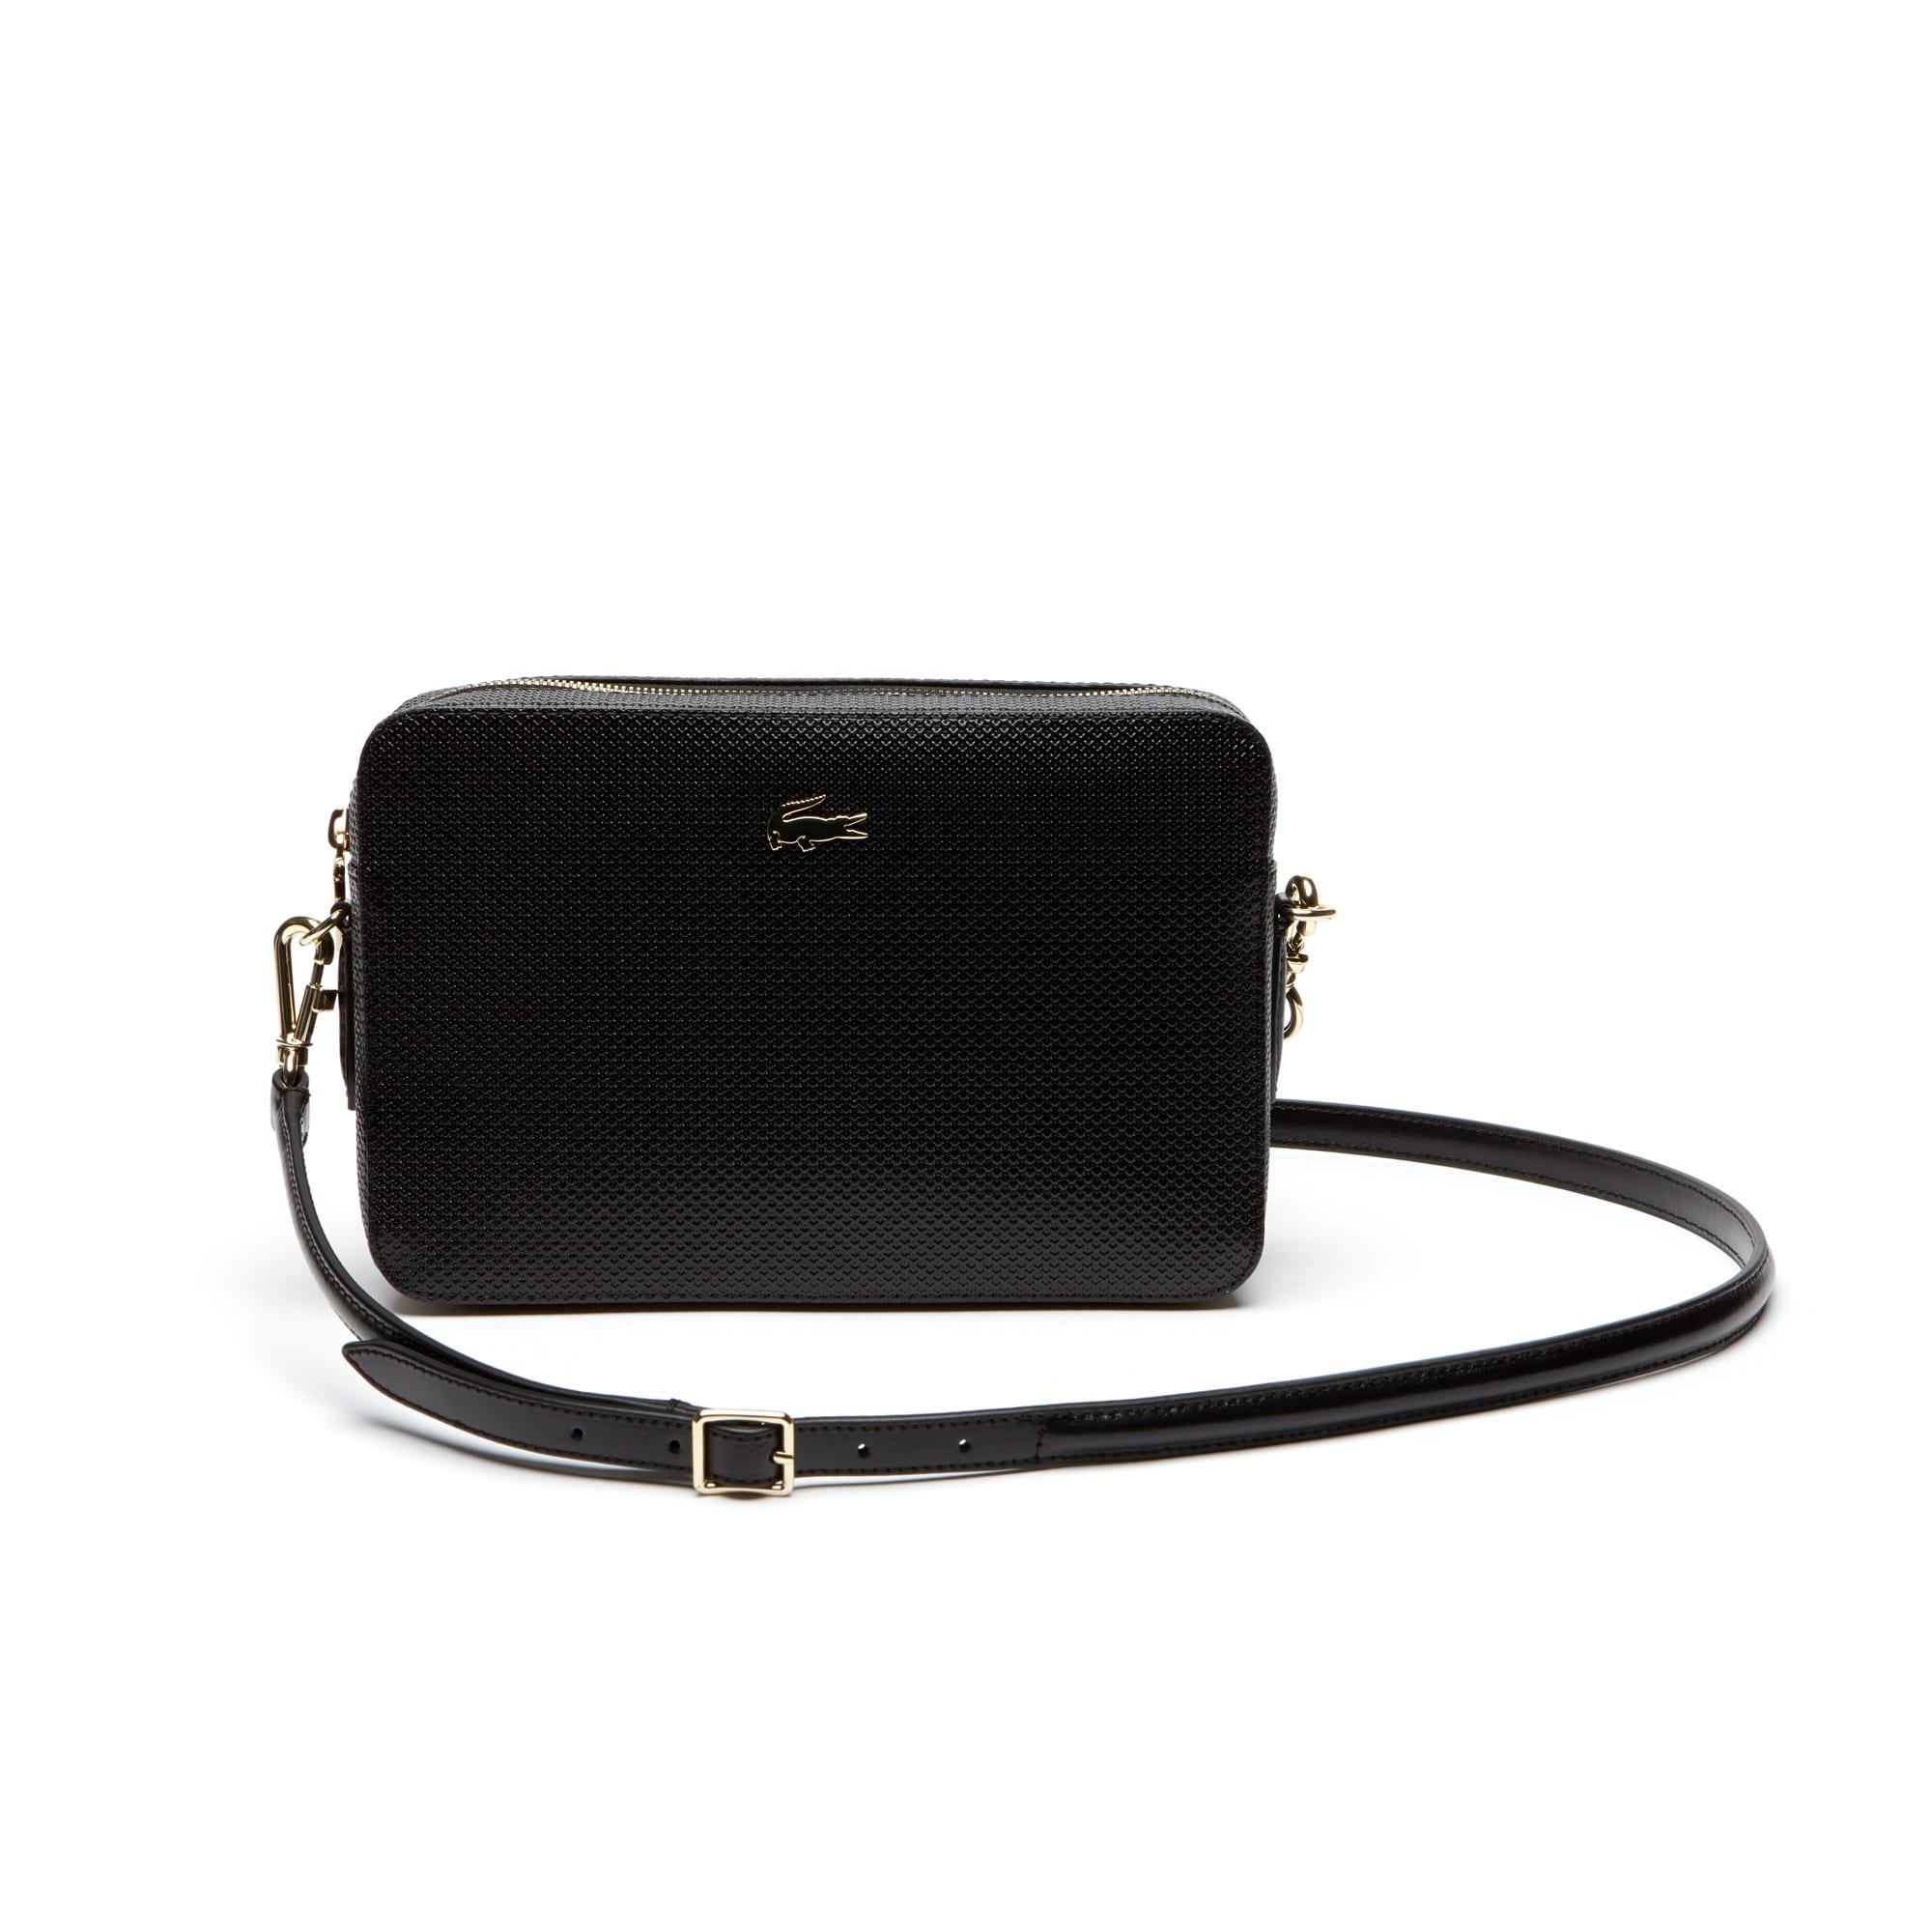 cb4e5634b565 Women s Chantaco Piqué Leather Square Crossover Bag. Colour   BLACK